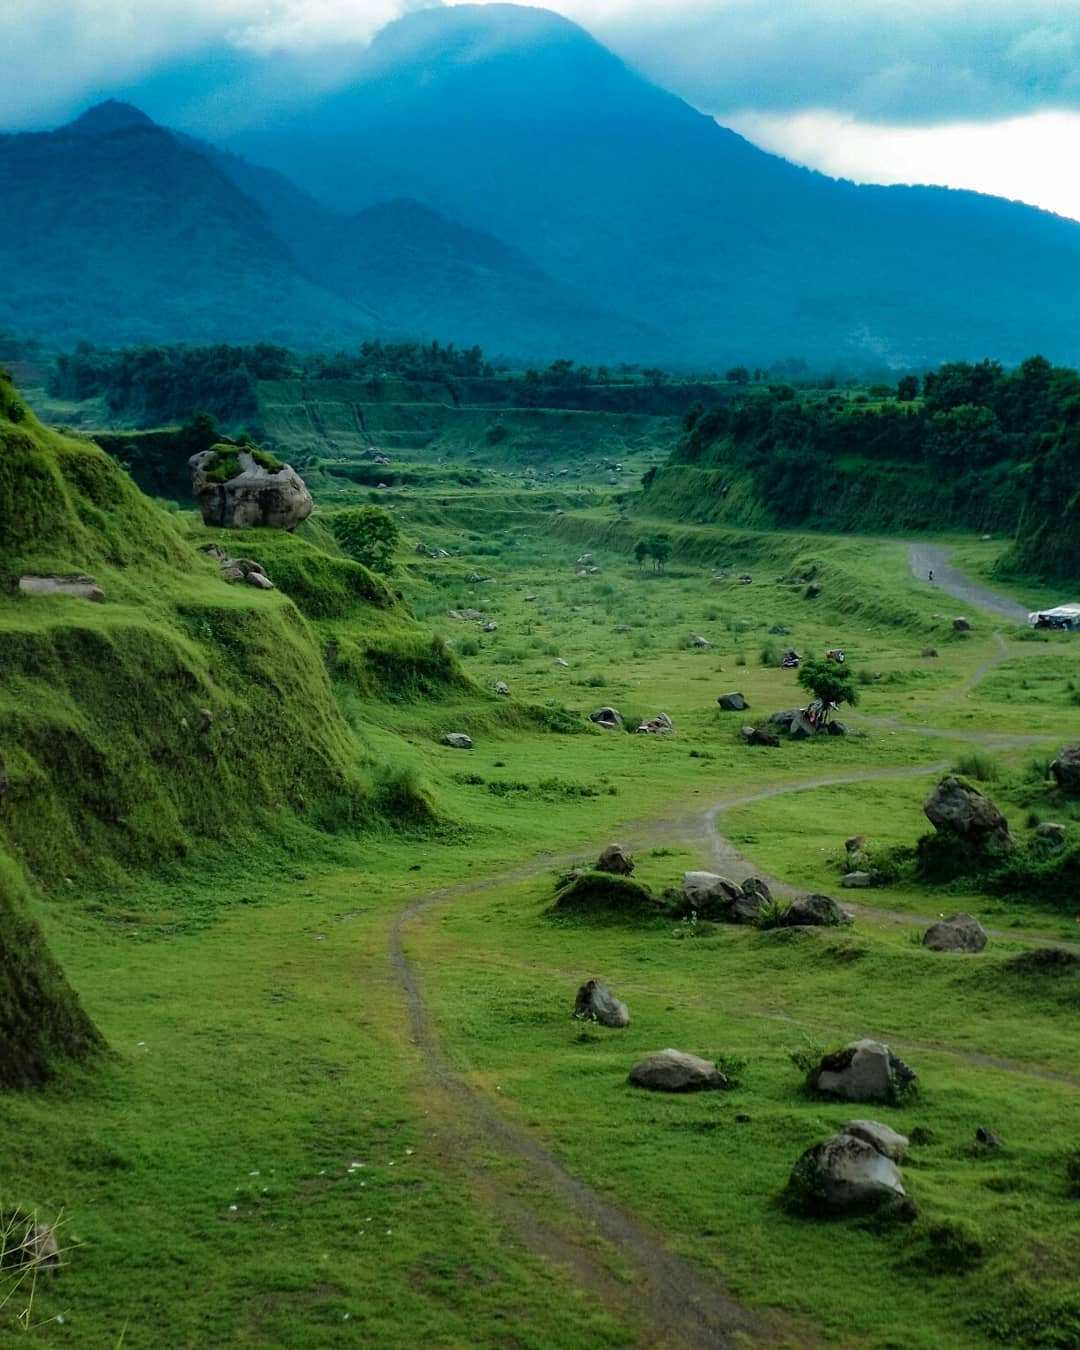 Hamparan Hijau di Ranu Manduro Mojokerto Image From @amir_zainuddinn